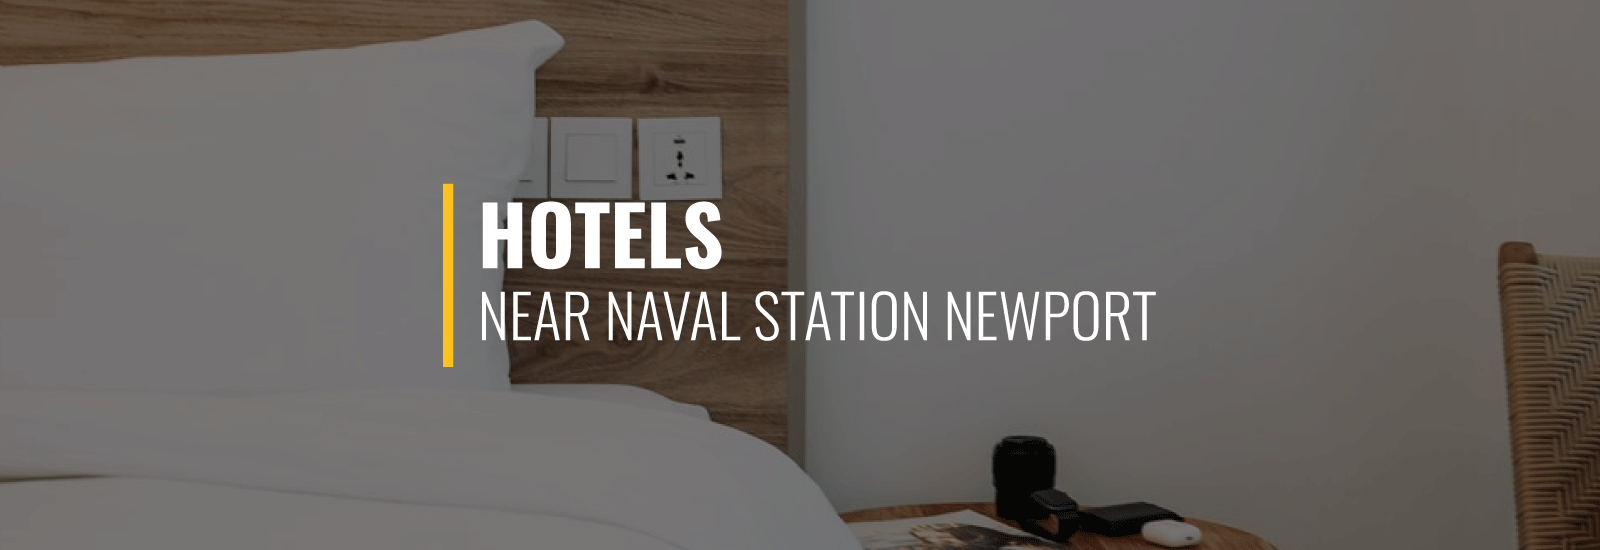 Hotels Near Naval Station Newport